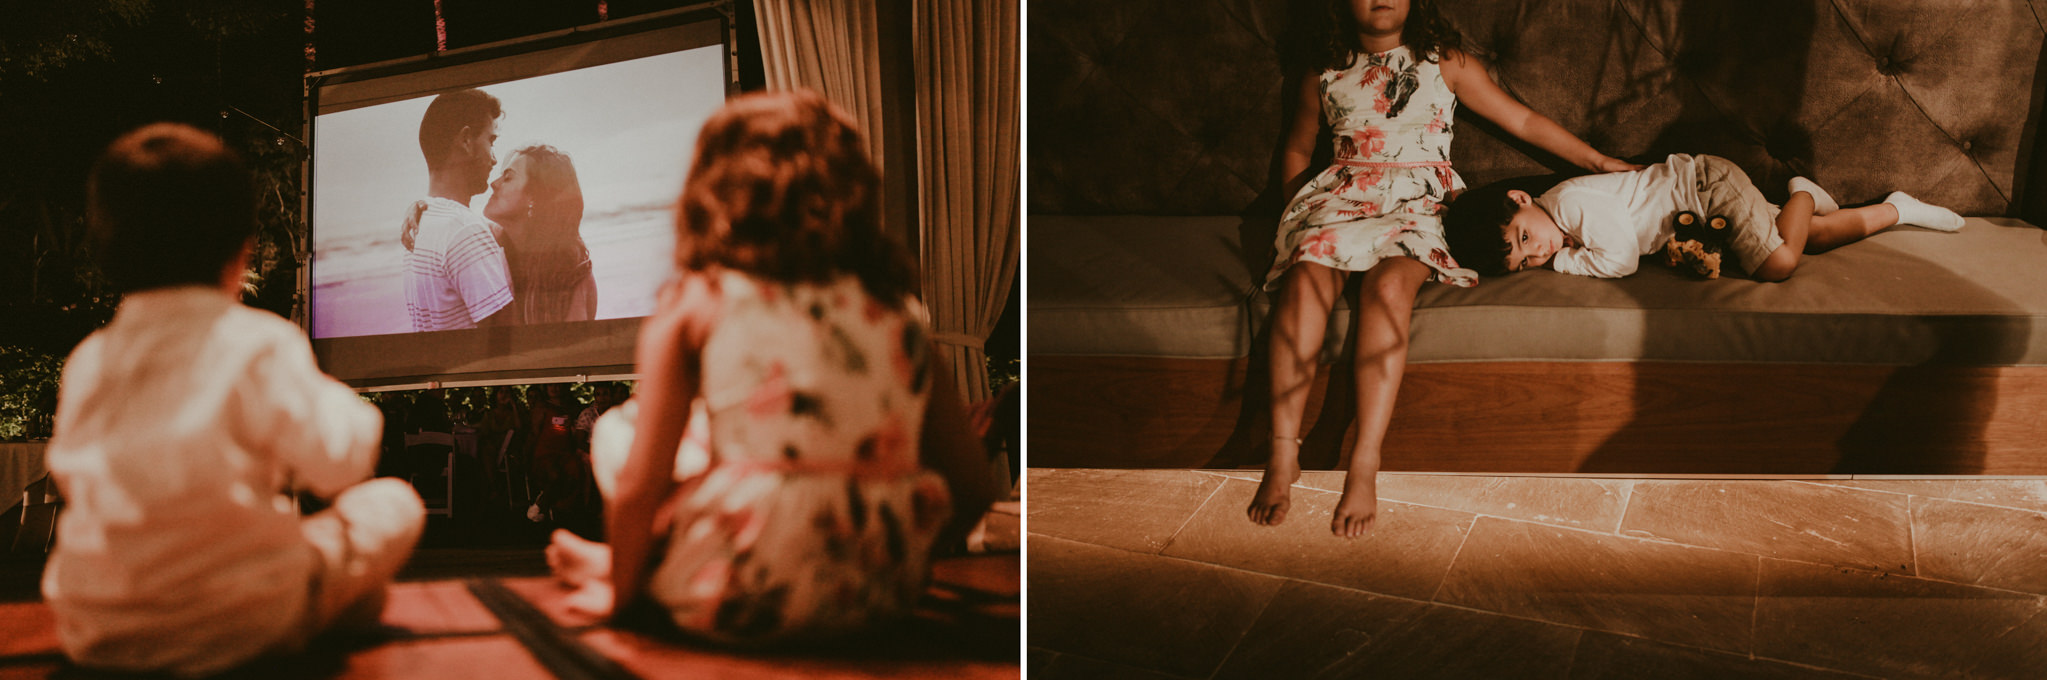 boda-diferente-fotografo-boda-laspalmas-grancanaria-103